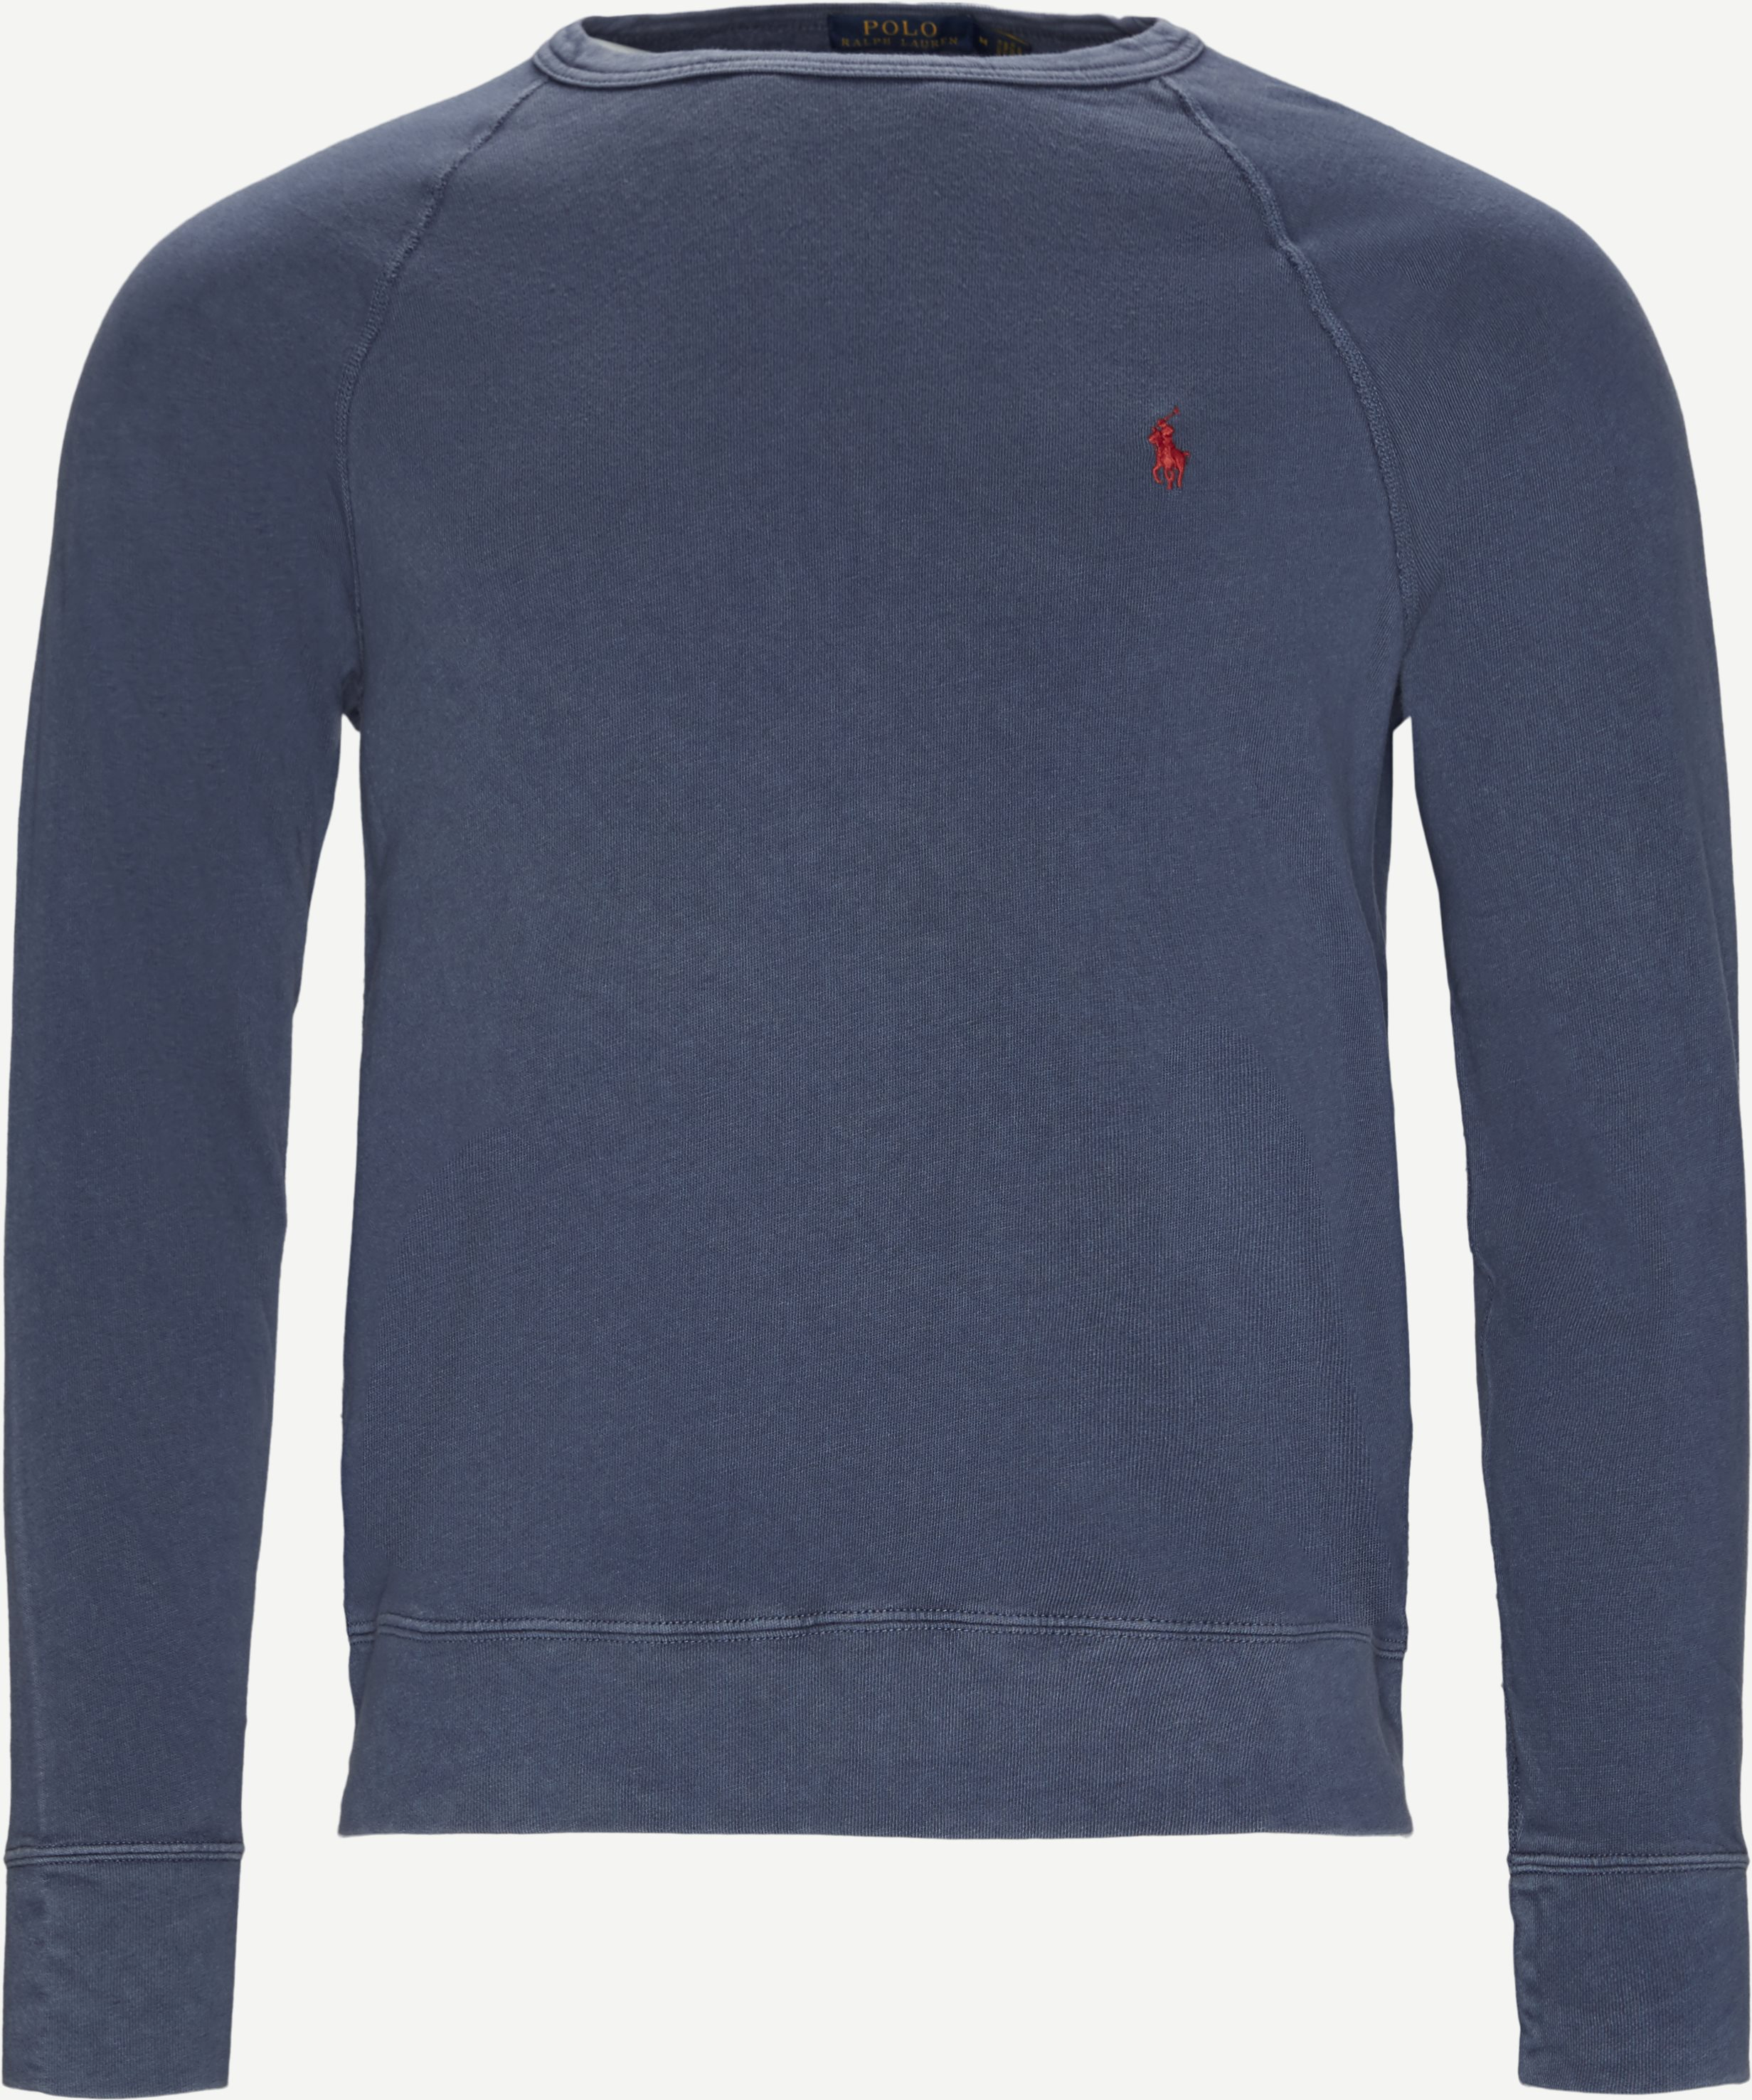 Sweatshirts - Regular - Denim